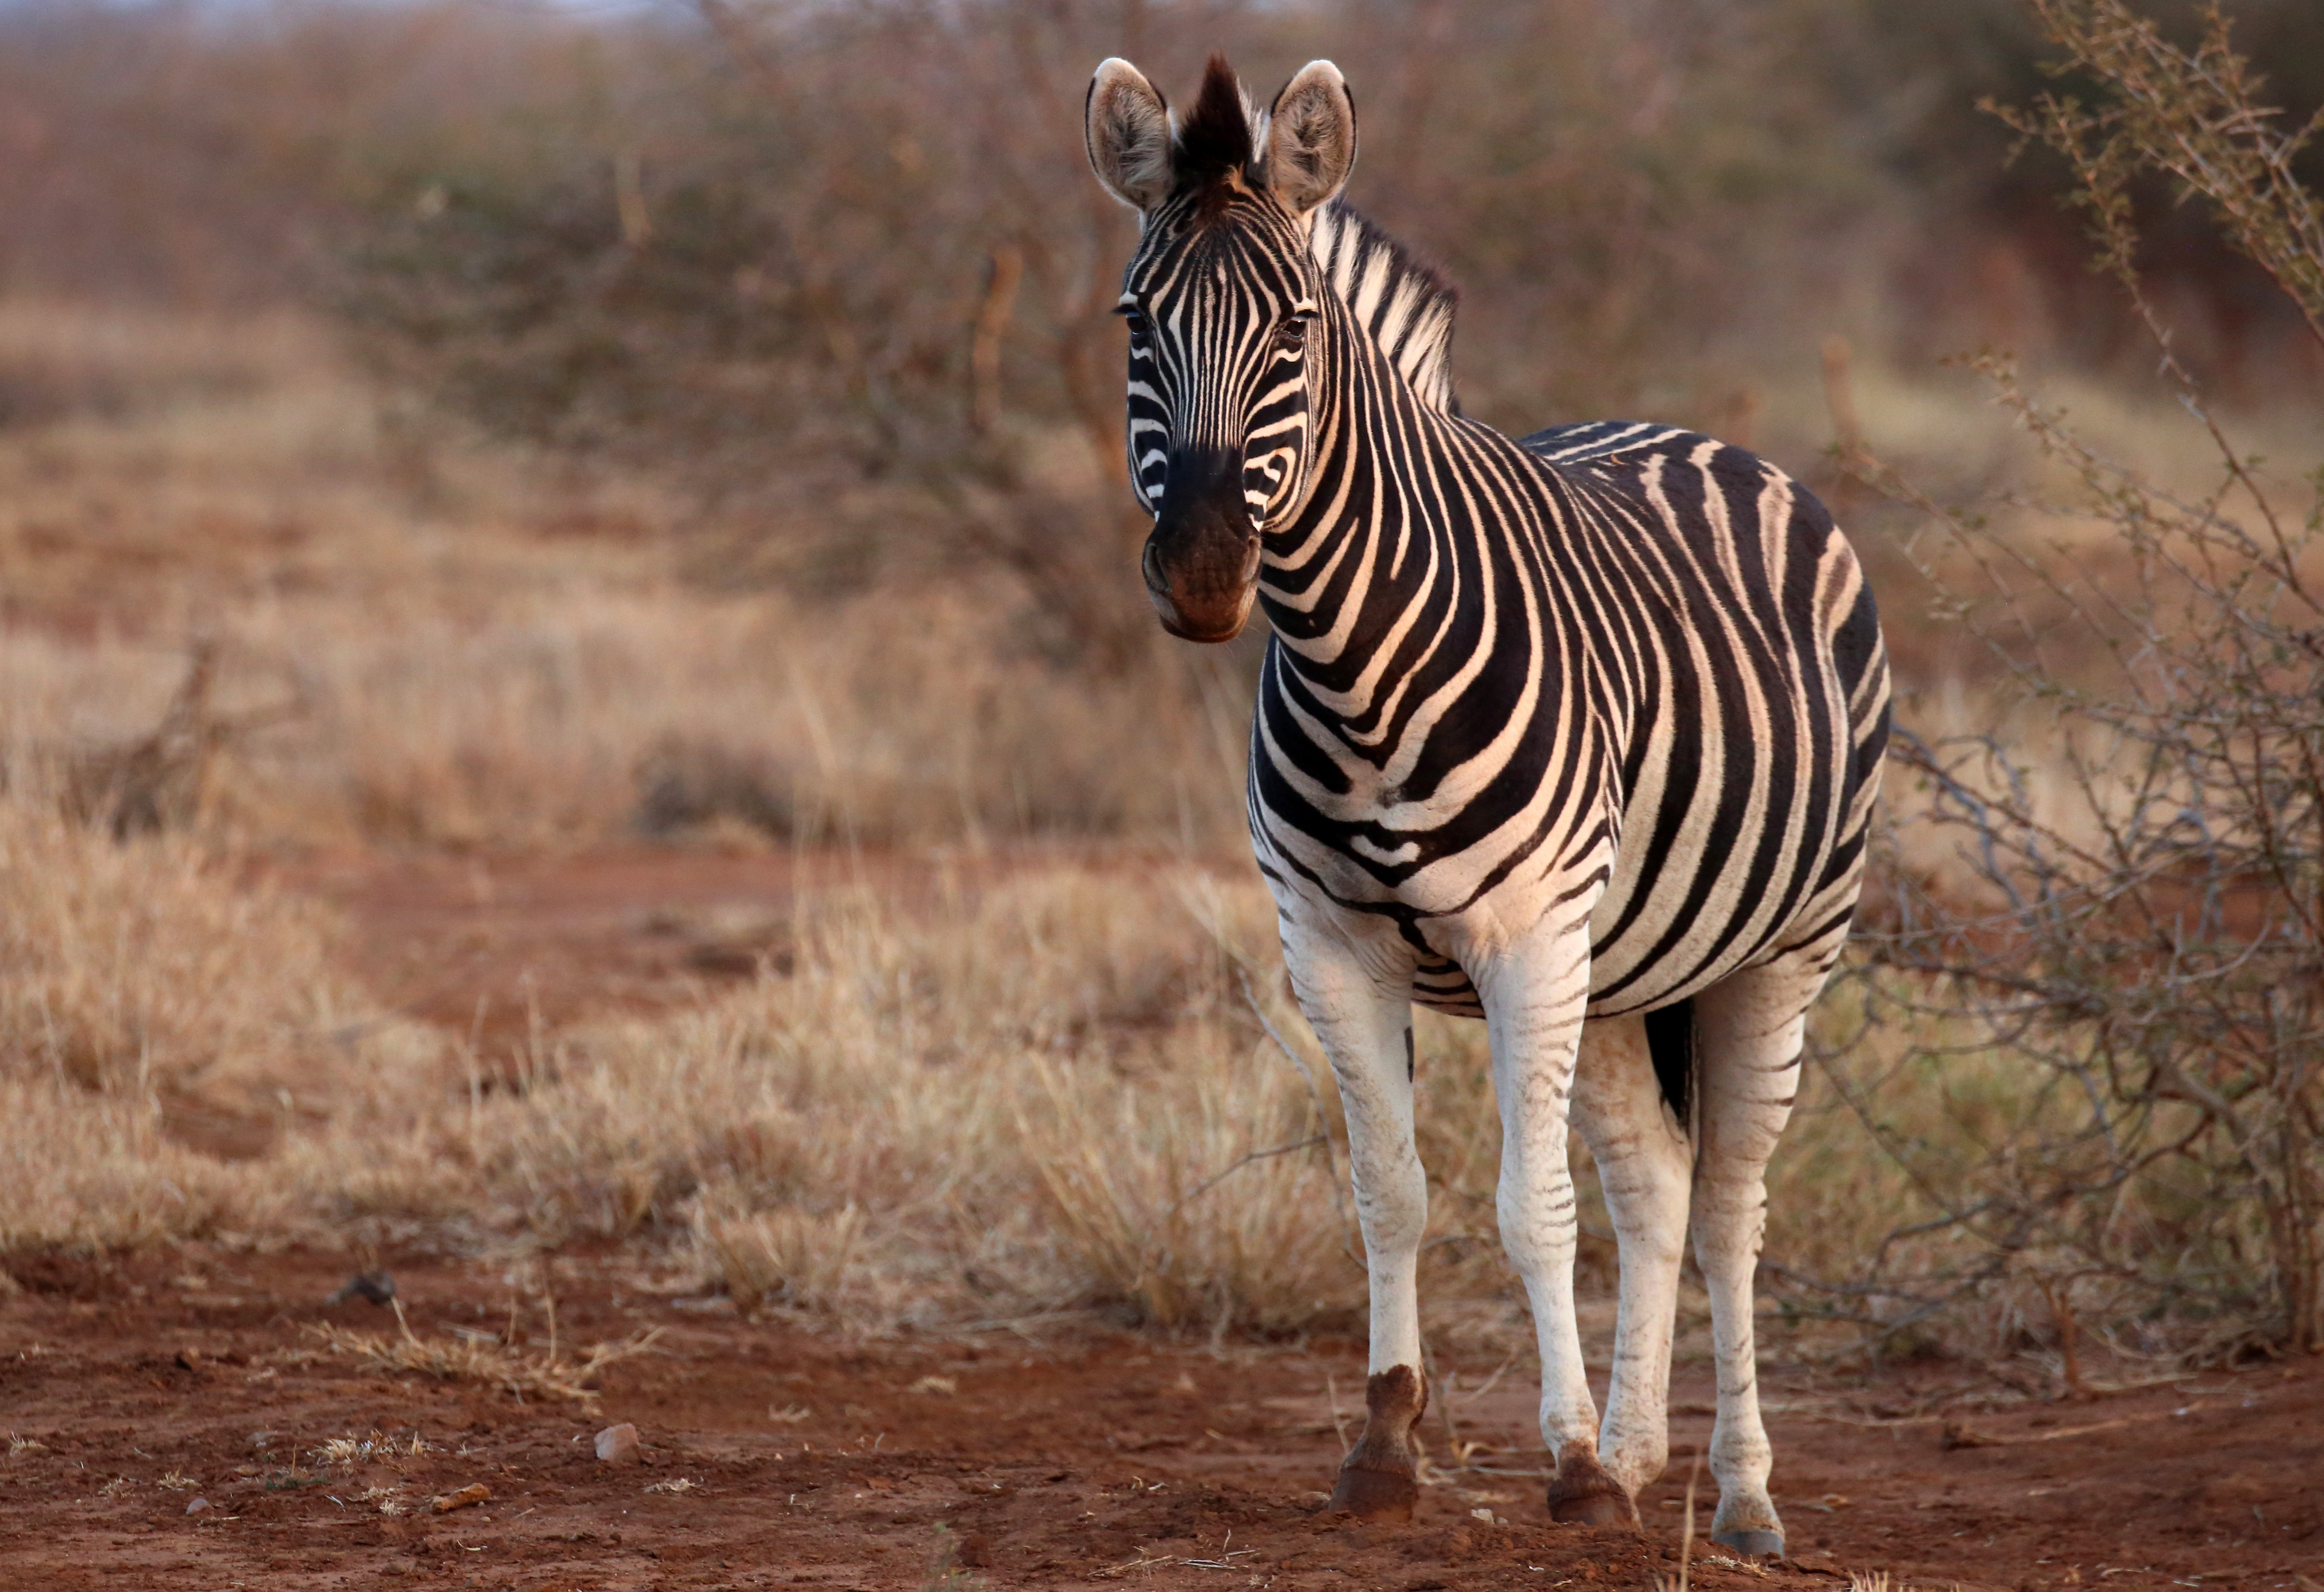 76290 download wallpaper Animals, Zebra, Animal, Wildlife, Safari screensavers and pictures for free